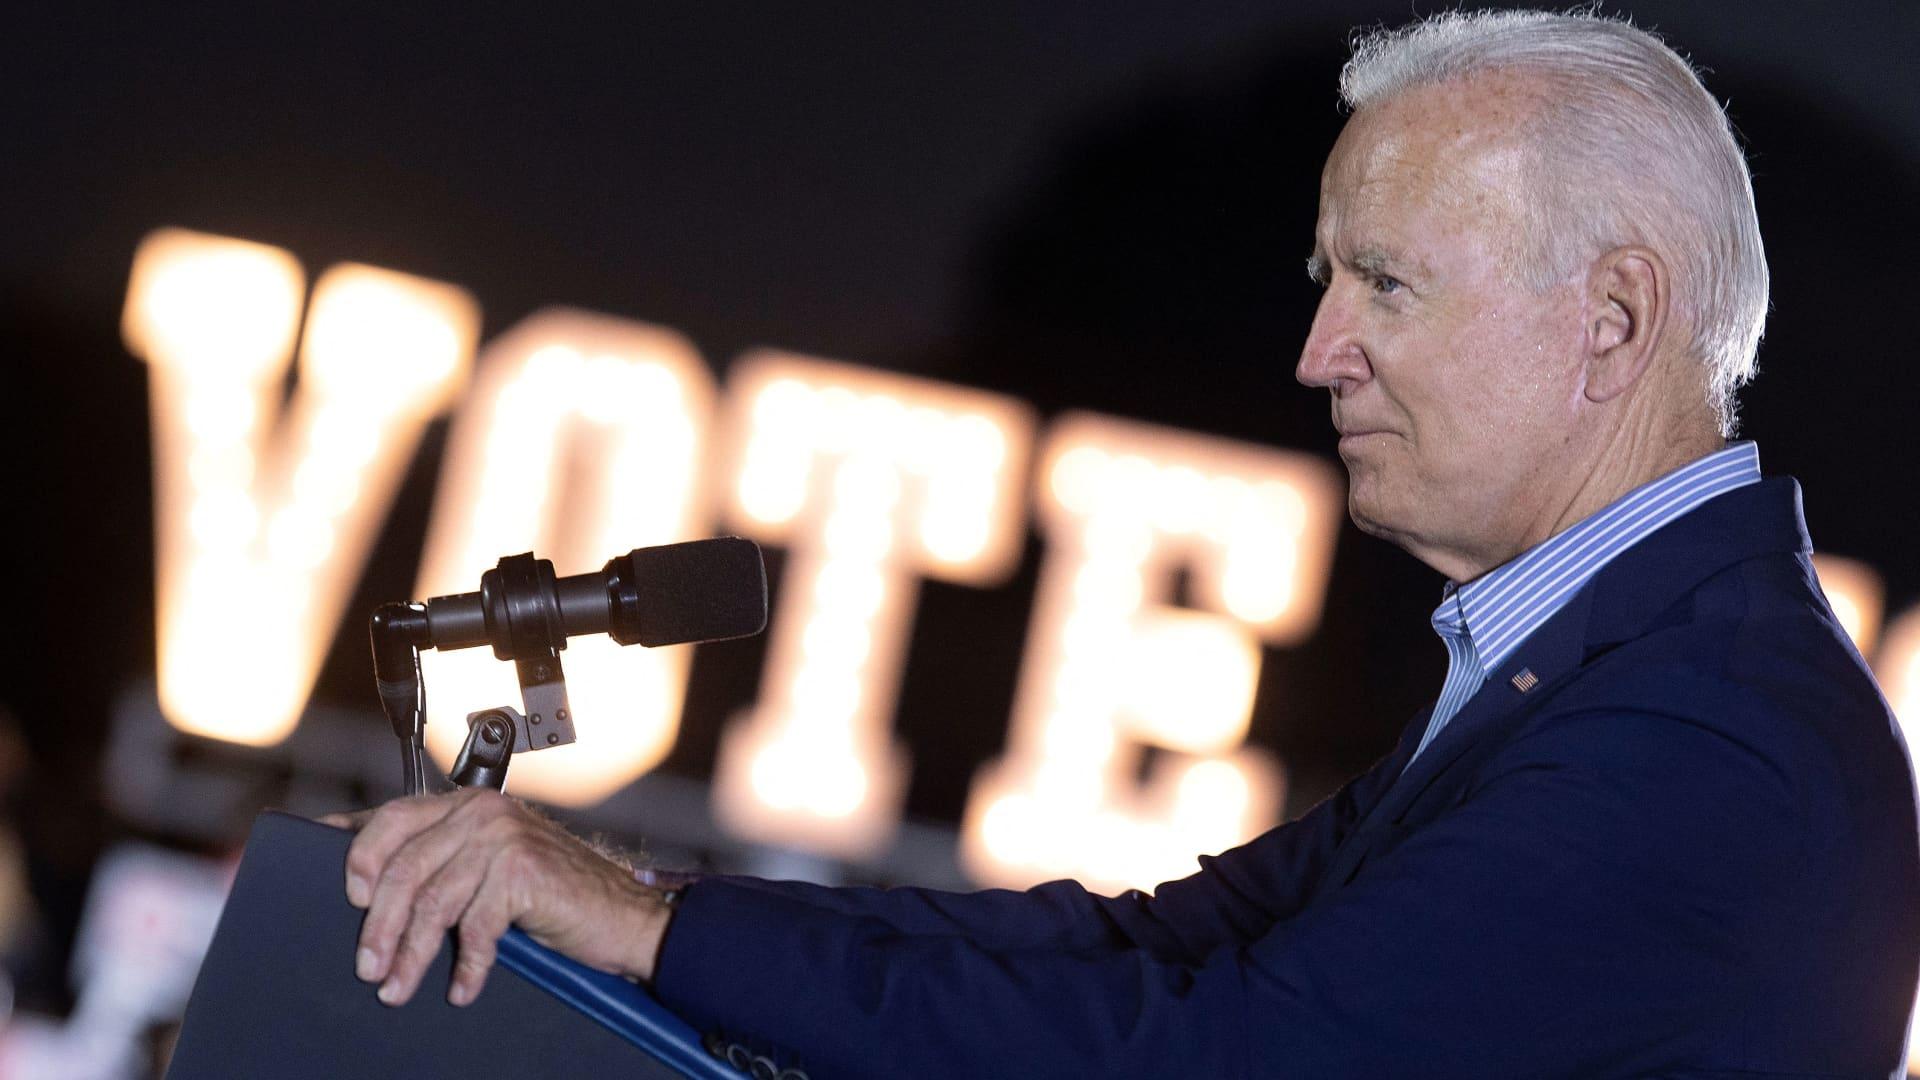 US President Joe Biden speaks during a campaign event for California Governor Gavin Newsom at Long Beach City Collage in Long Beach, California on September 13, 2021.